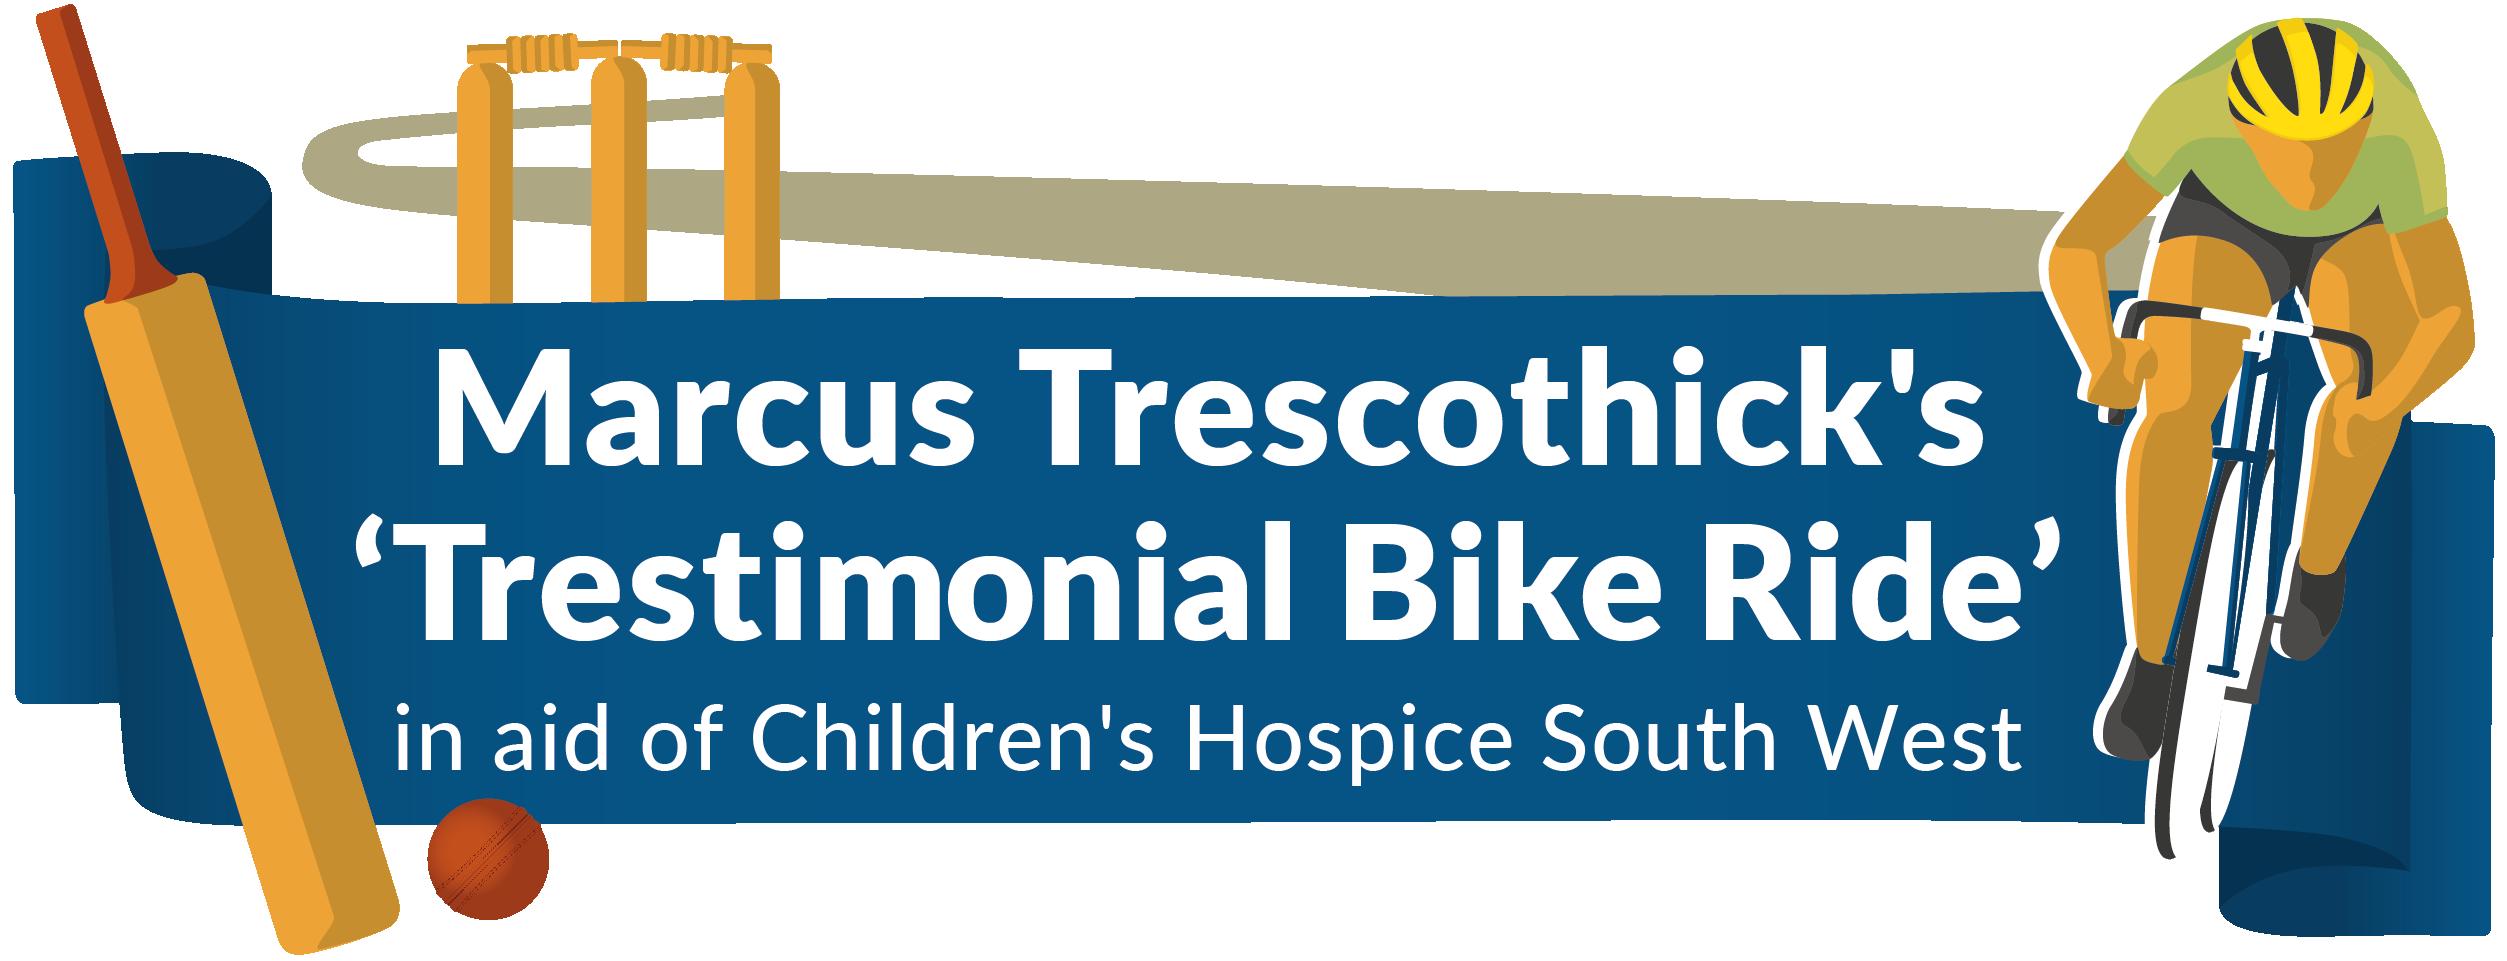 Marcus Trescothick Cycle Ride Logo